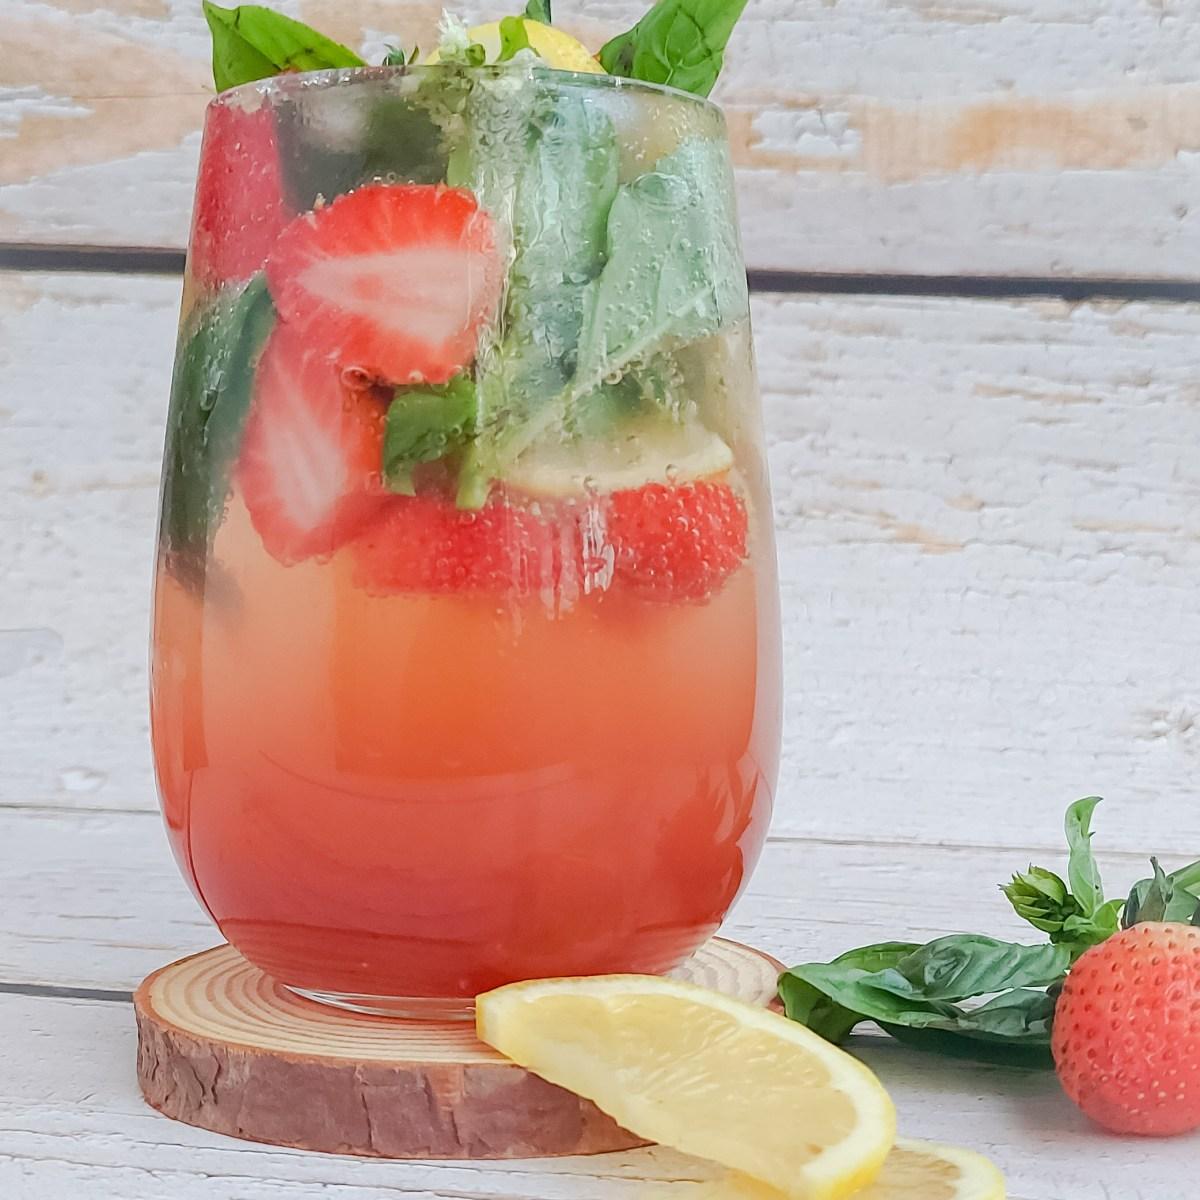 Strawberry Basil Lemonade - Parveenskitchen.com